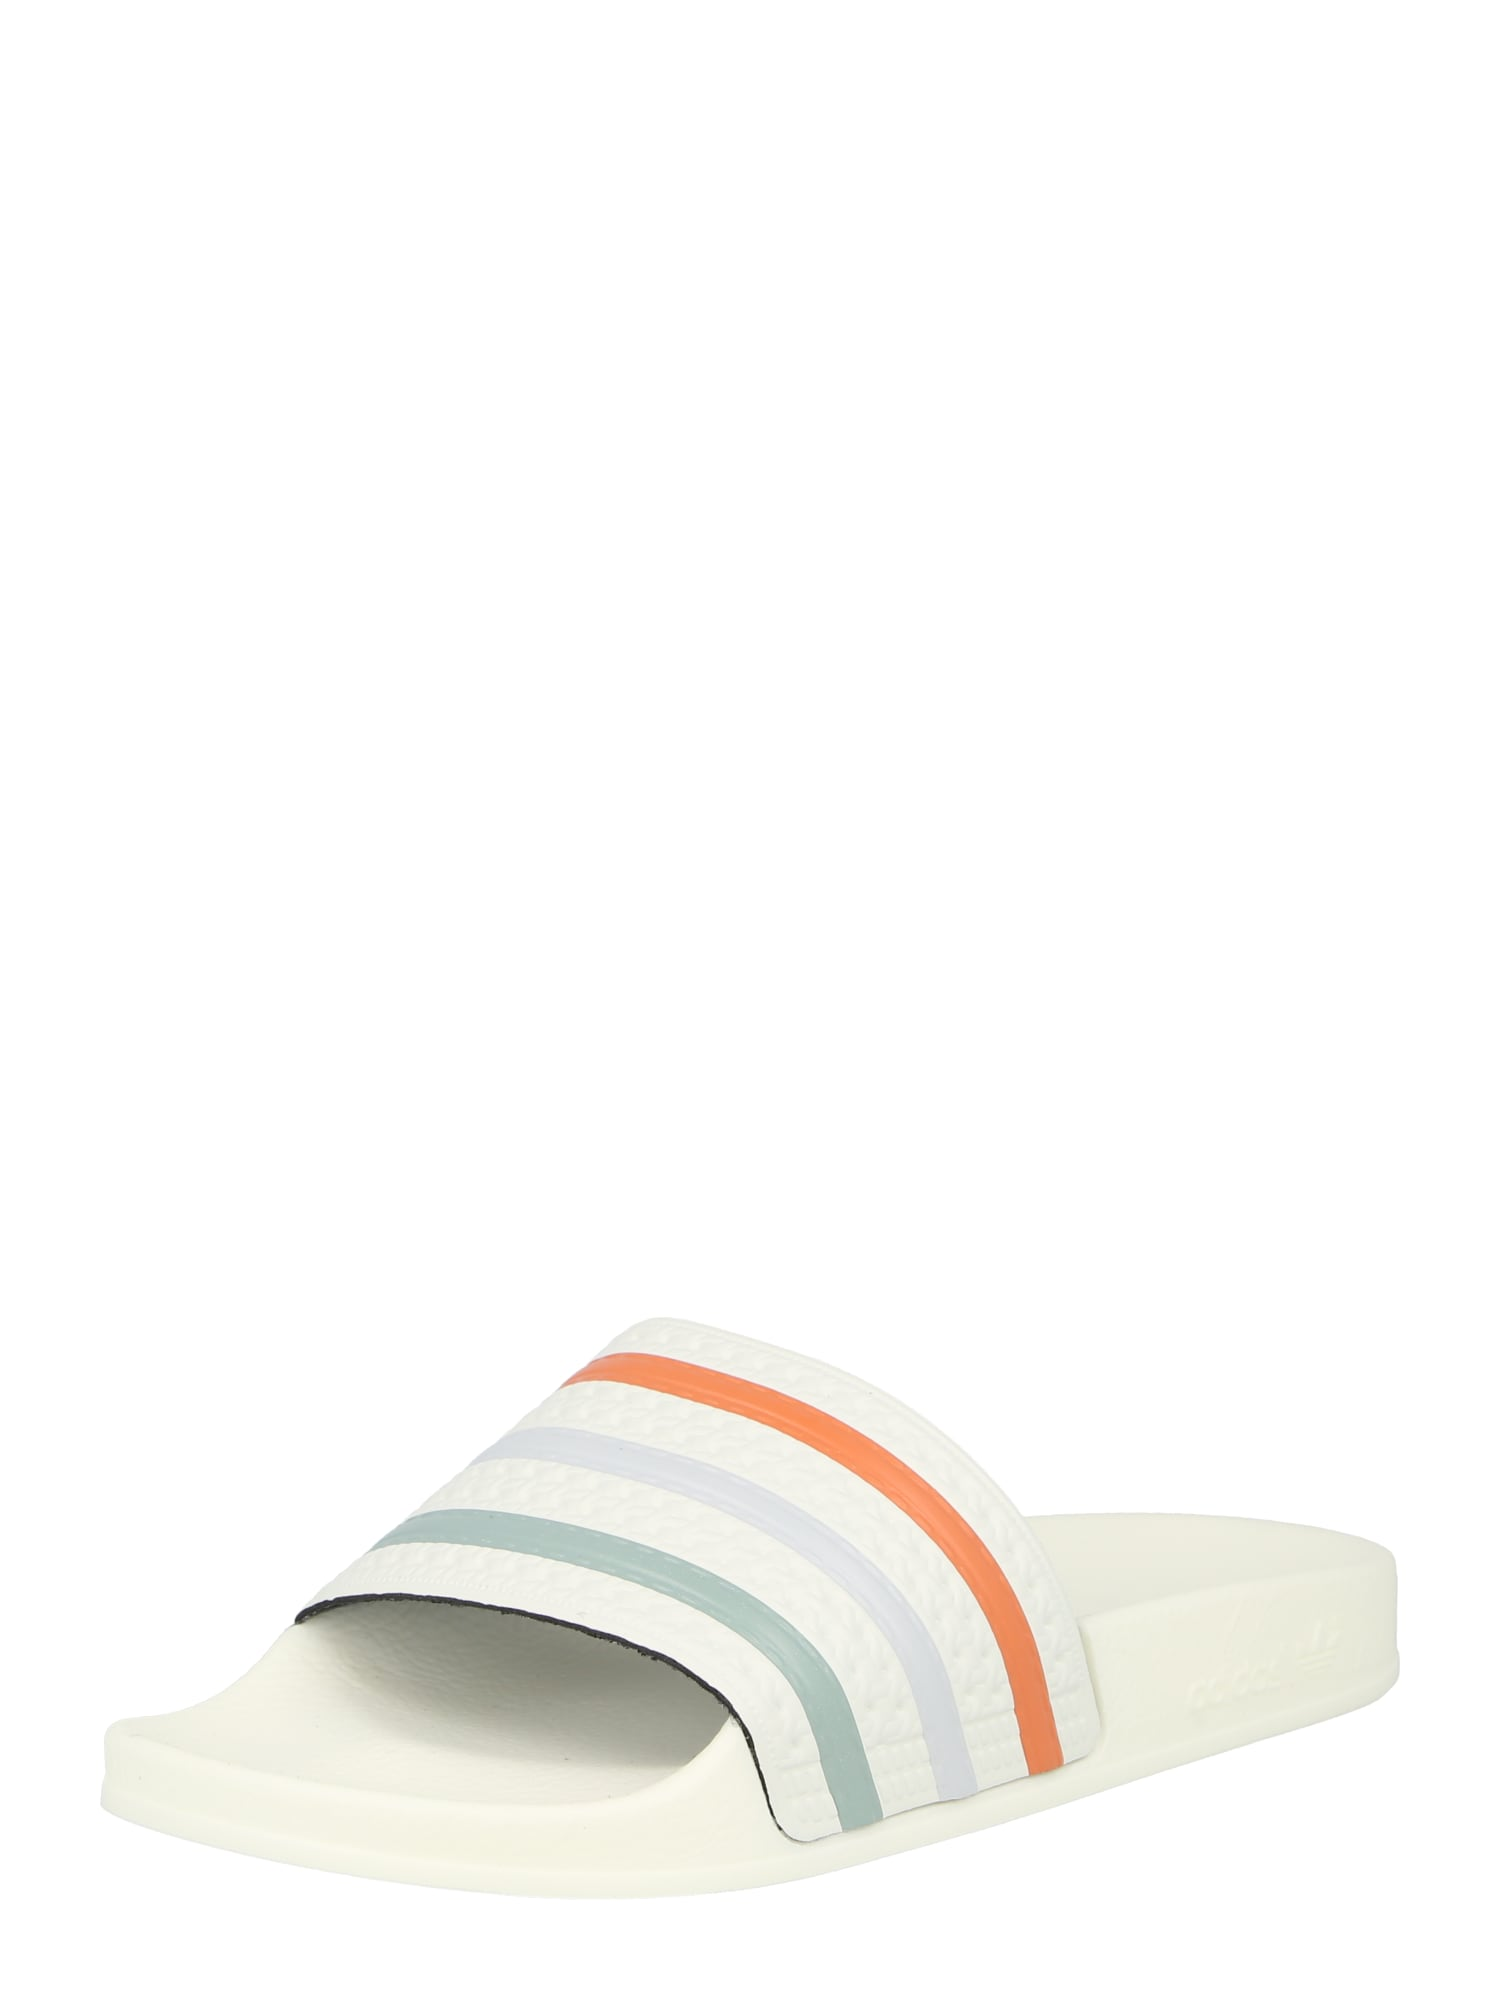 ADIDAS ORIGINALS Pantofle 'ADILETTE TOWEL'  bílá / oranžová / pastelově zelená / světlemodrá